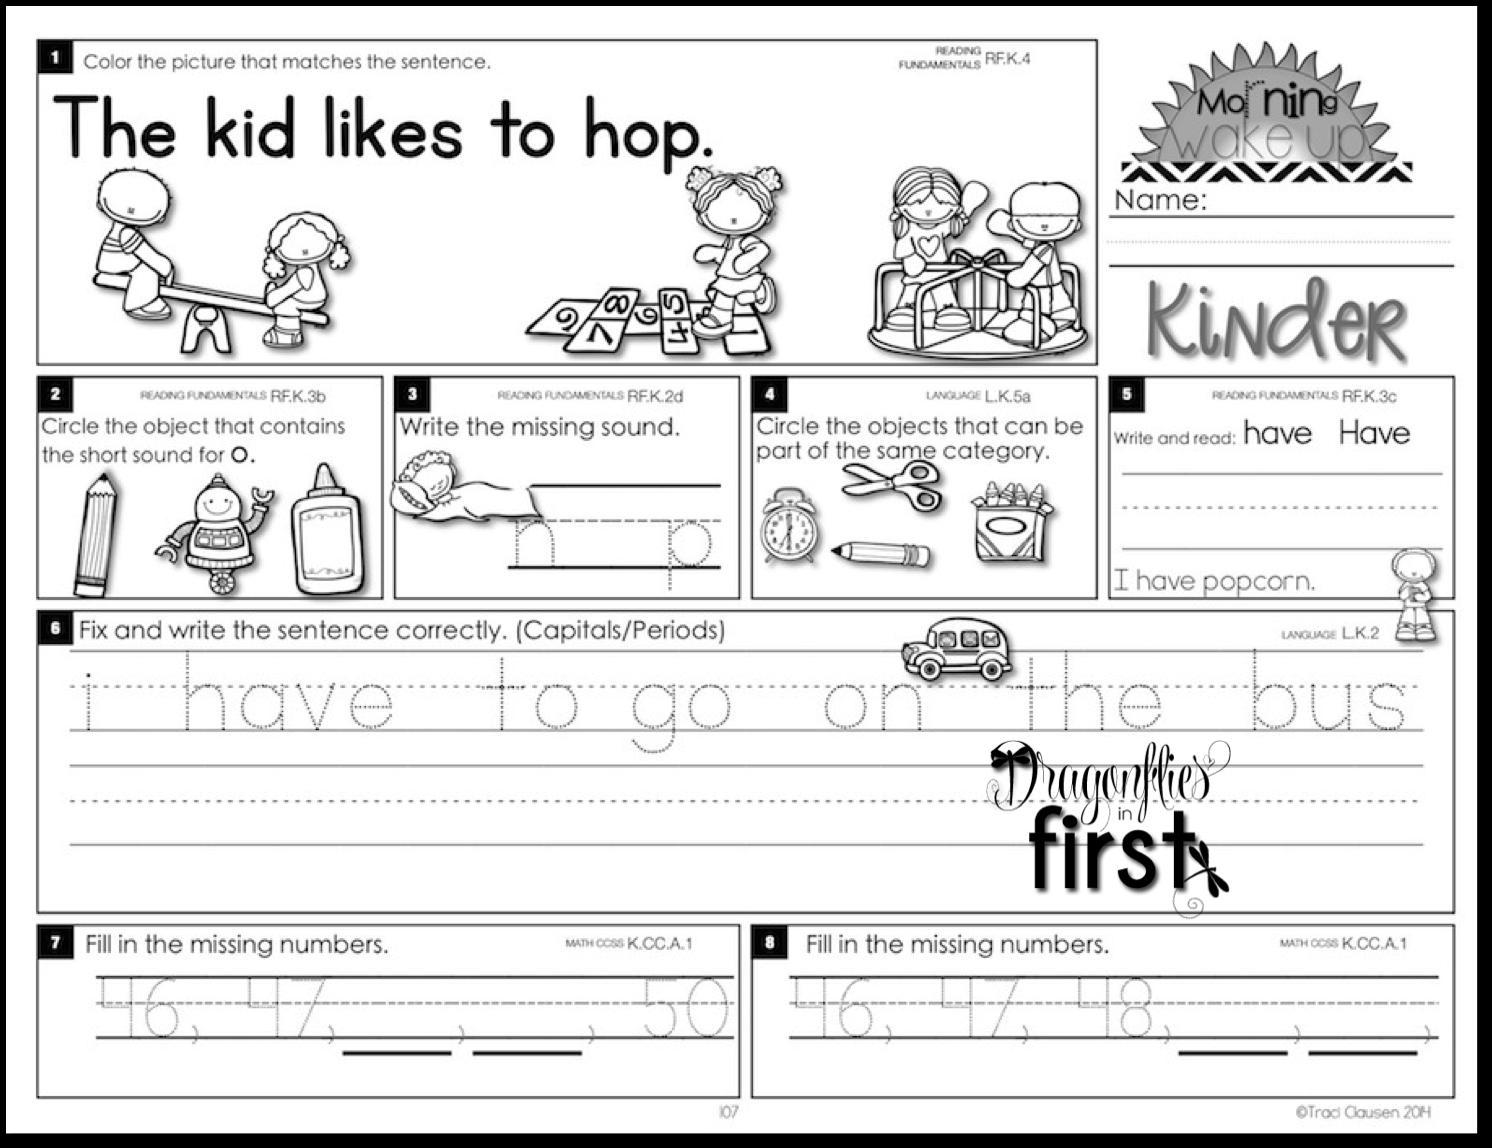 Free Printable Morning Worksheets : Kindergarten morning worksheets free printable